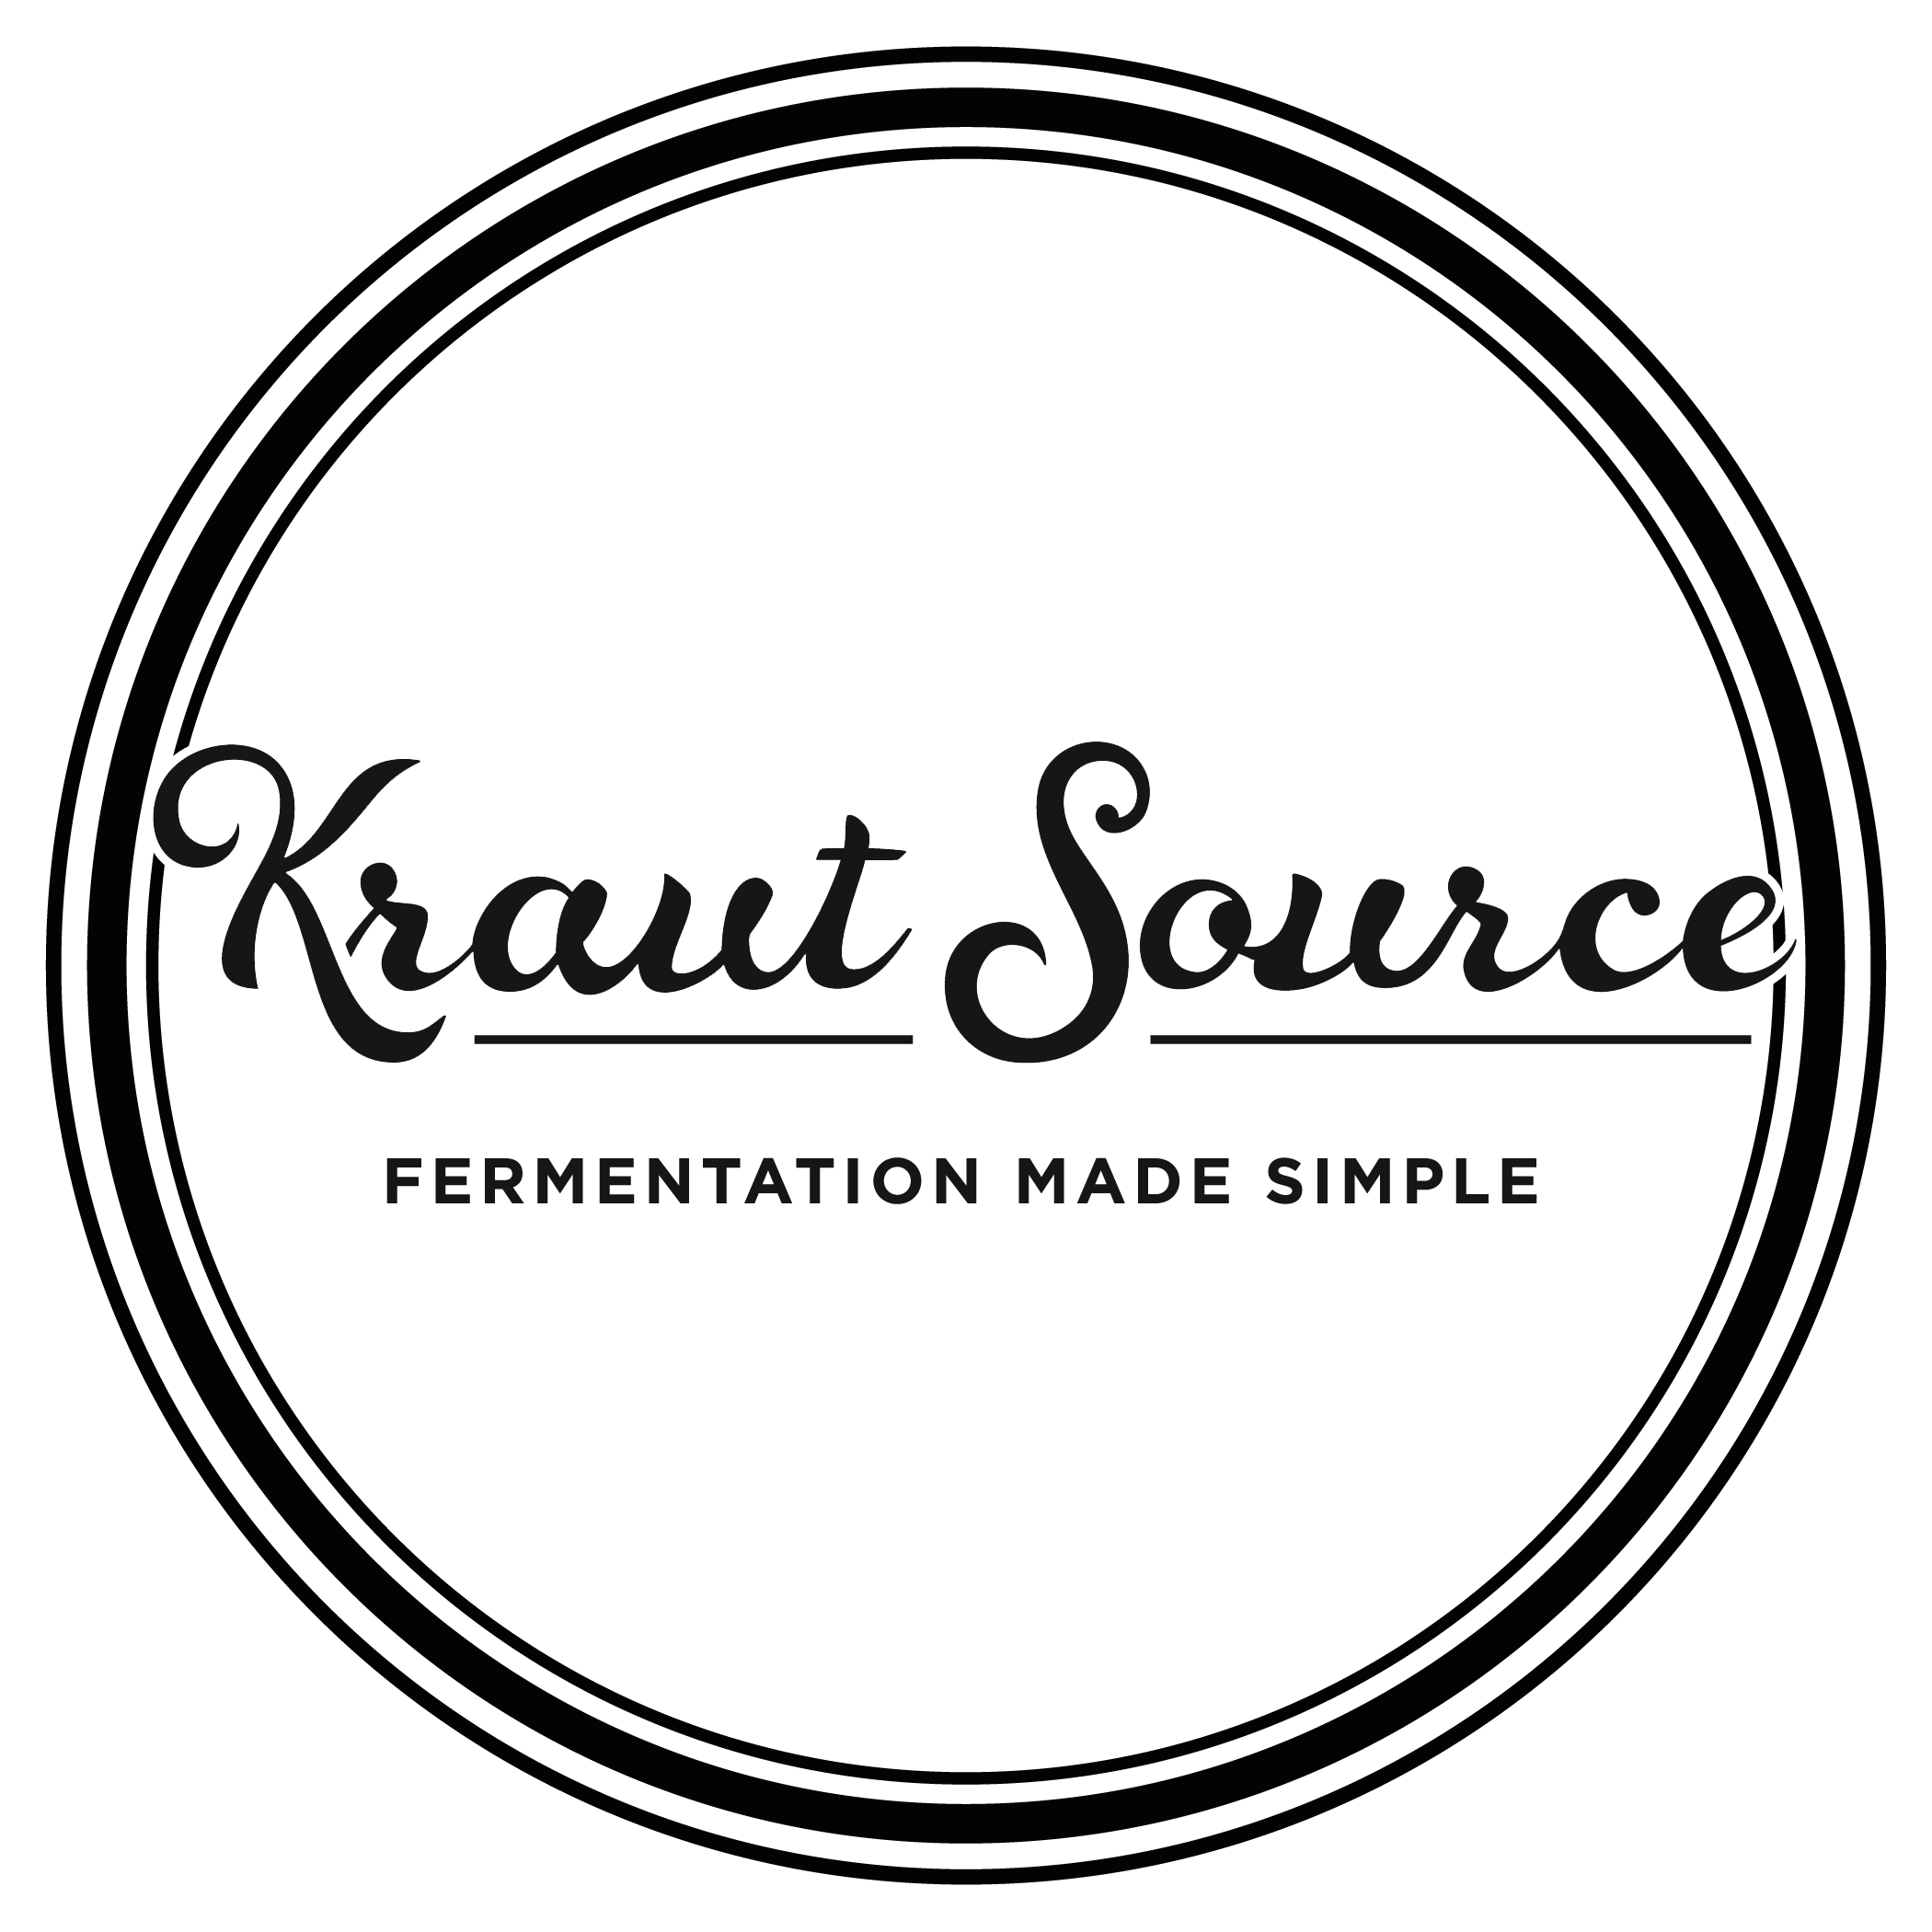 KRAUT SOURCE.jpg